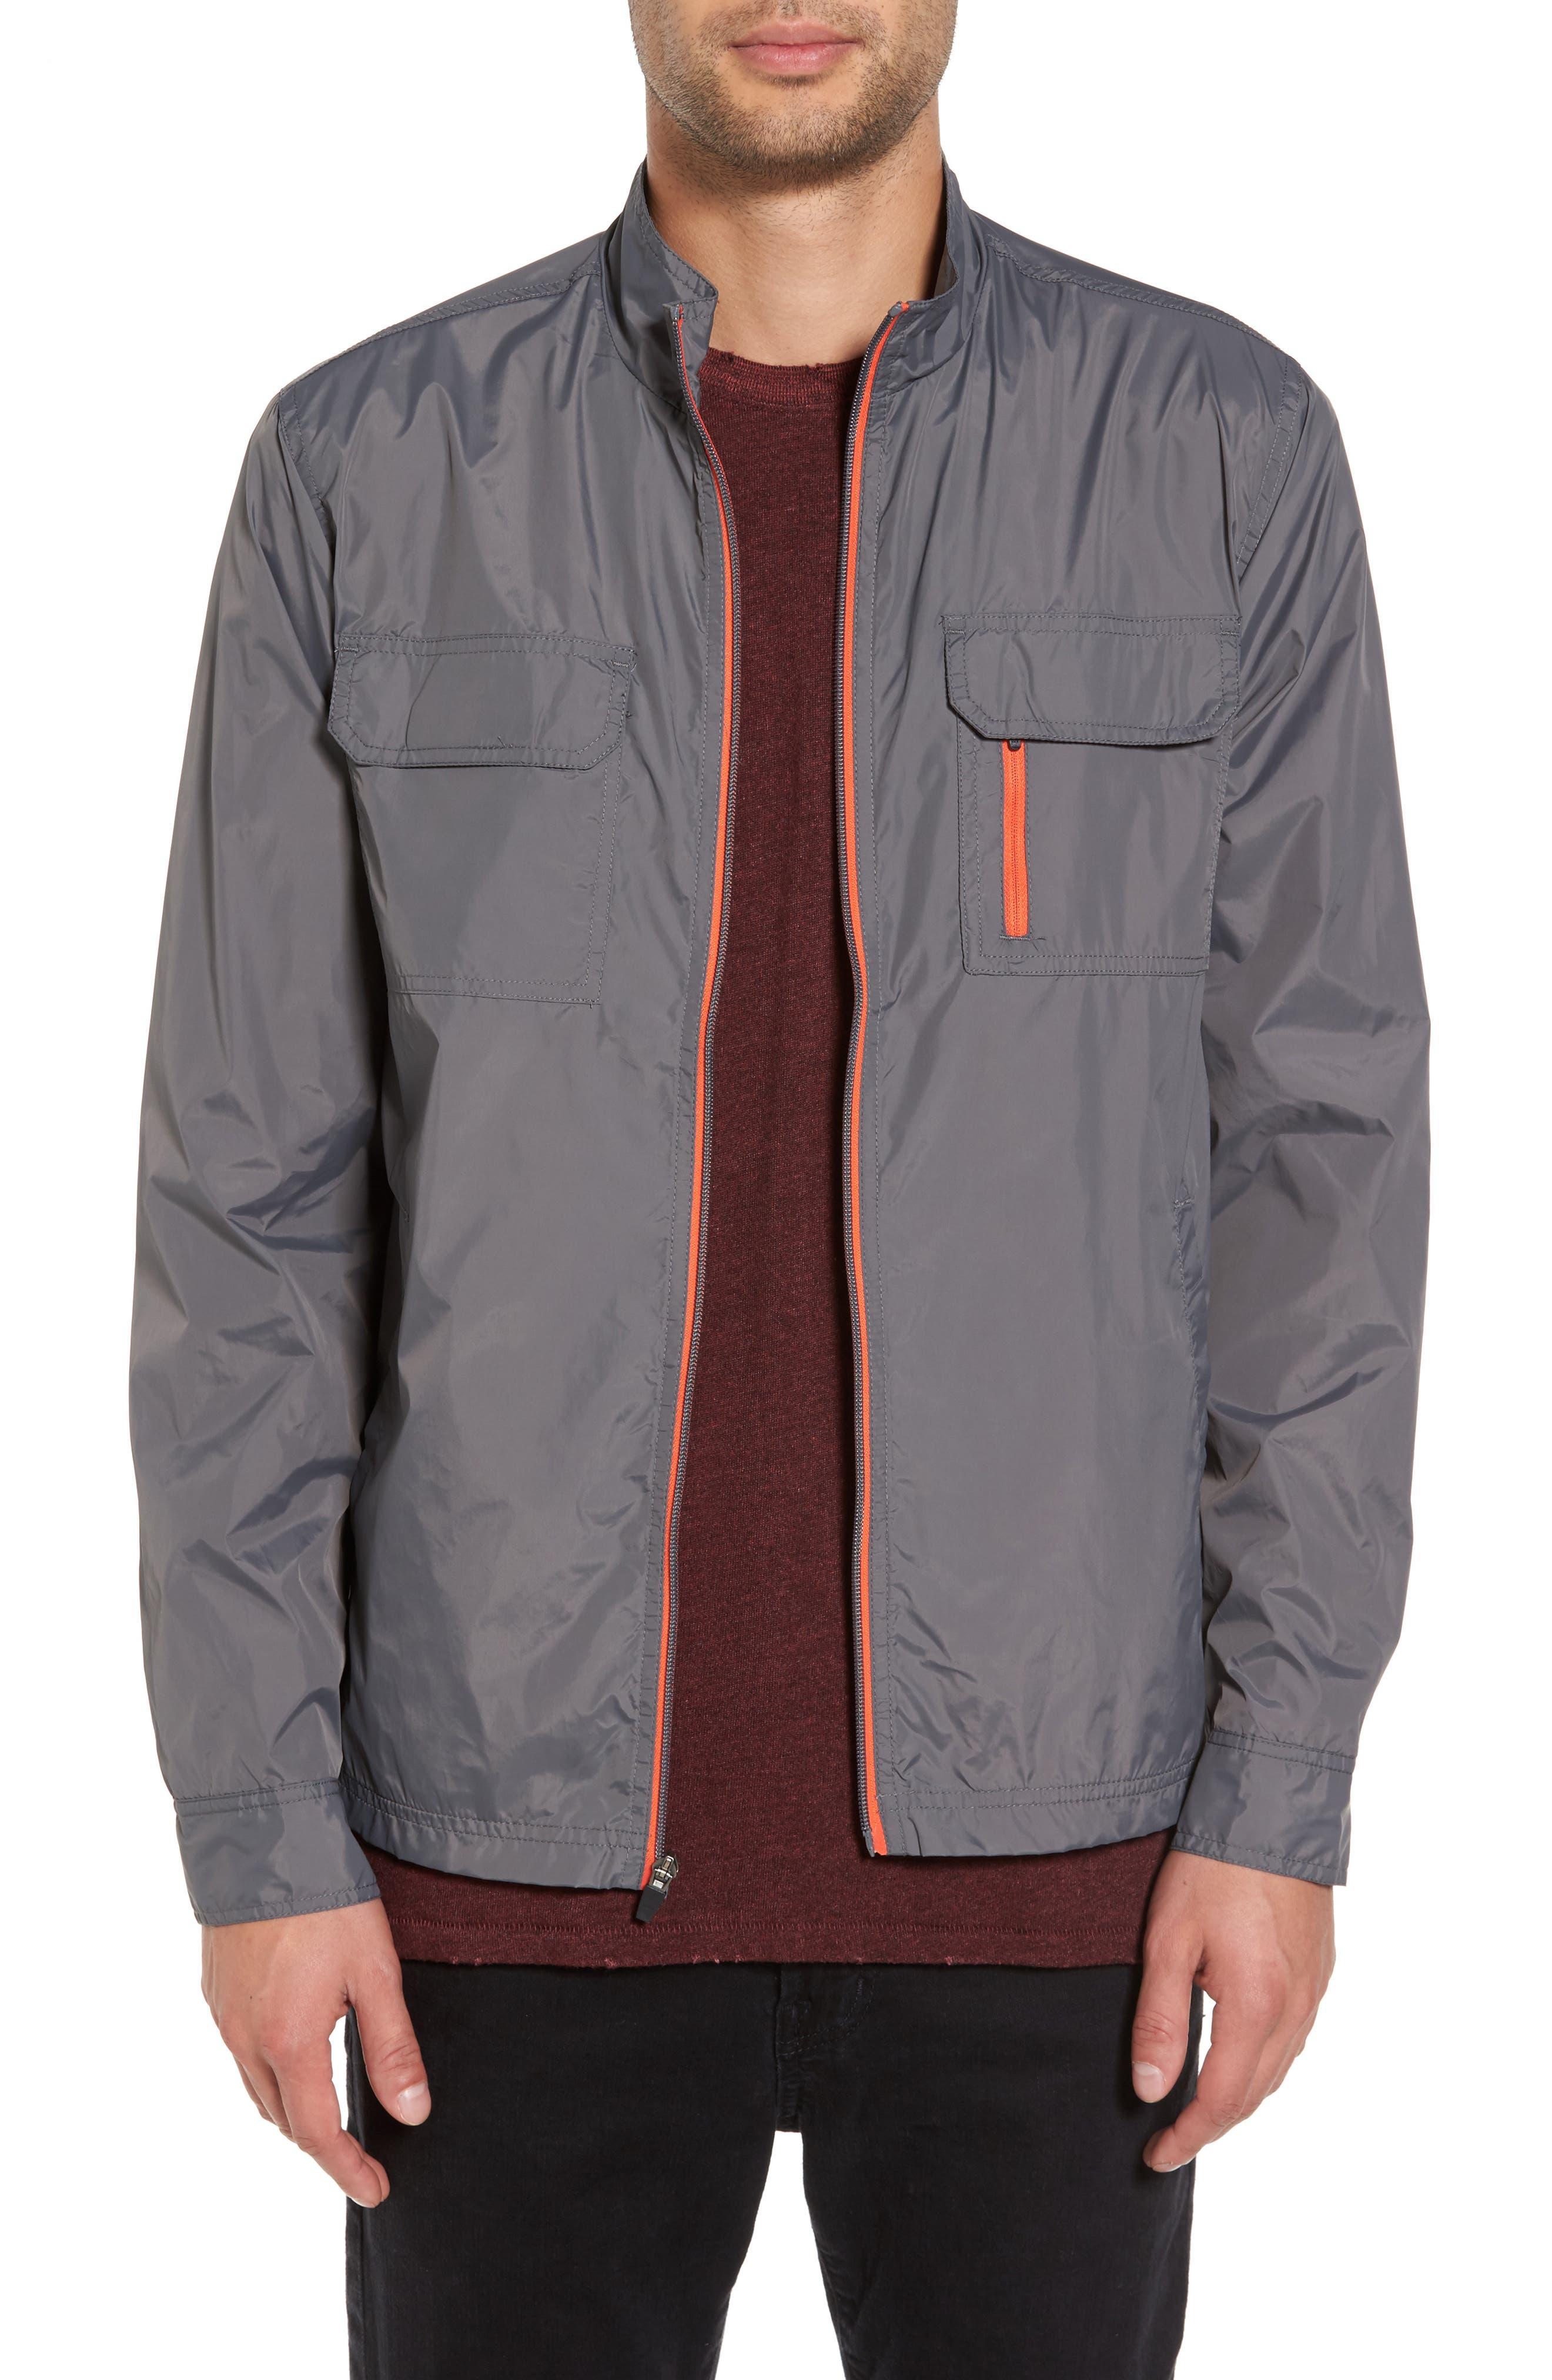 Staple Jacket,                         Main,                         color, Grey